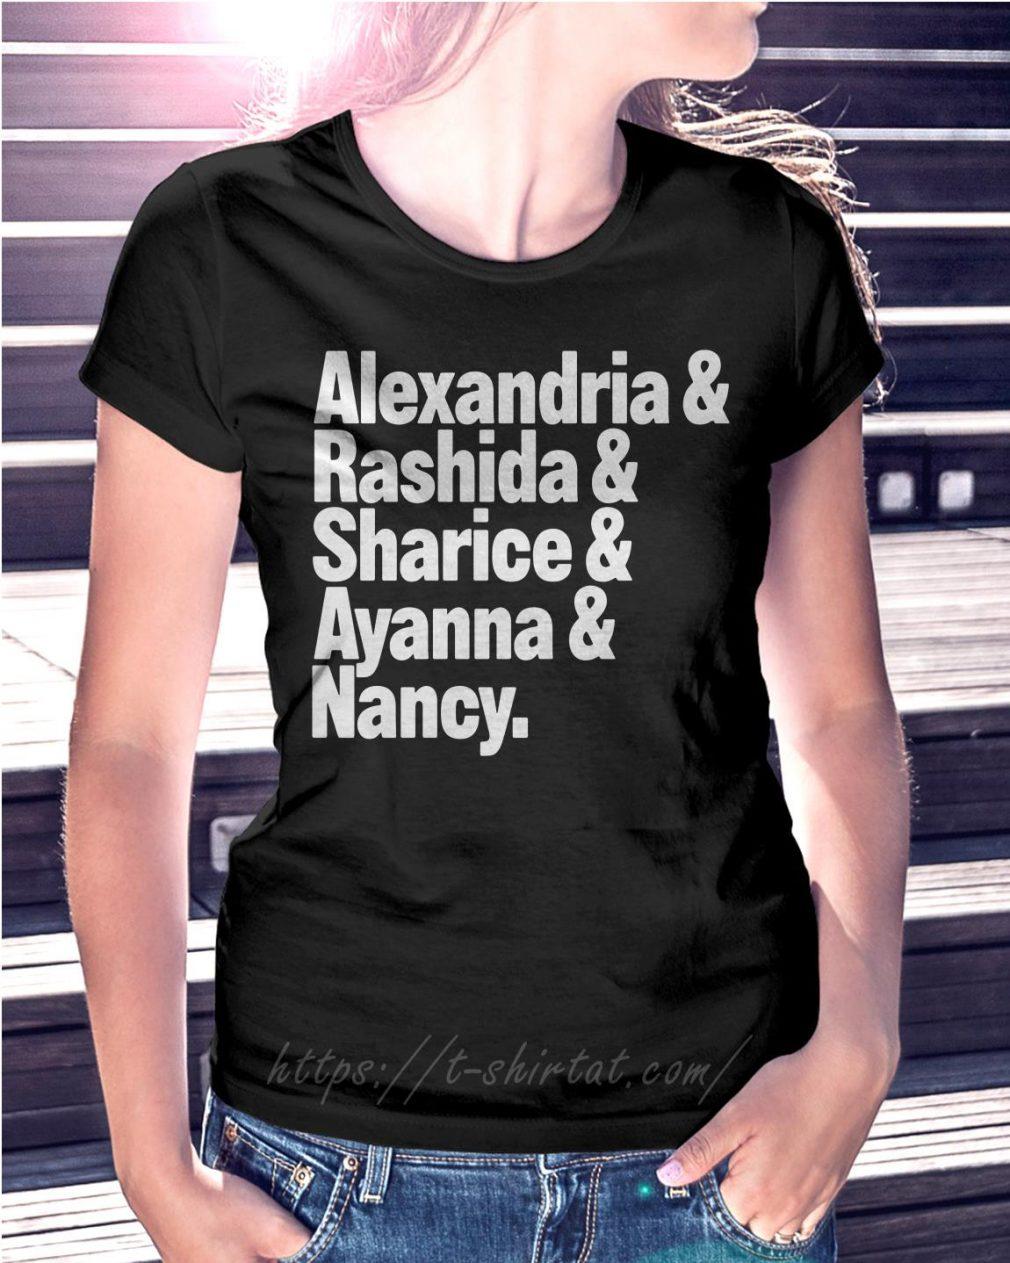 Alexandria and Rashida and Sharice and Ayanna and Nancy T-shirt